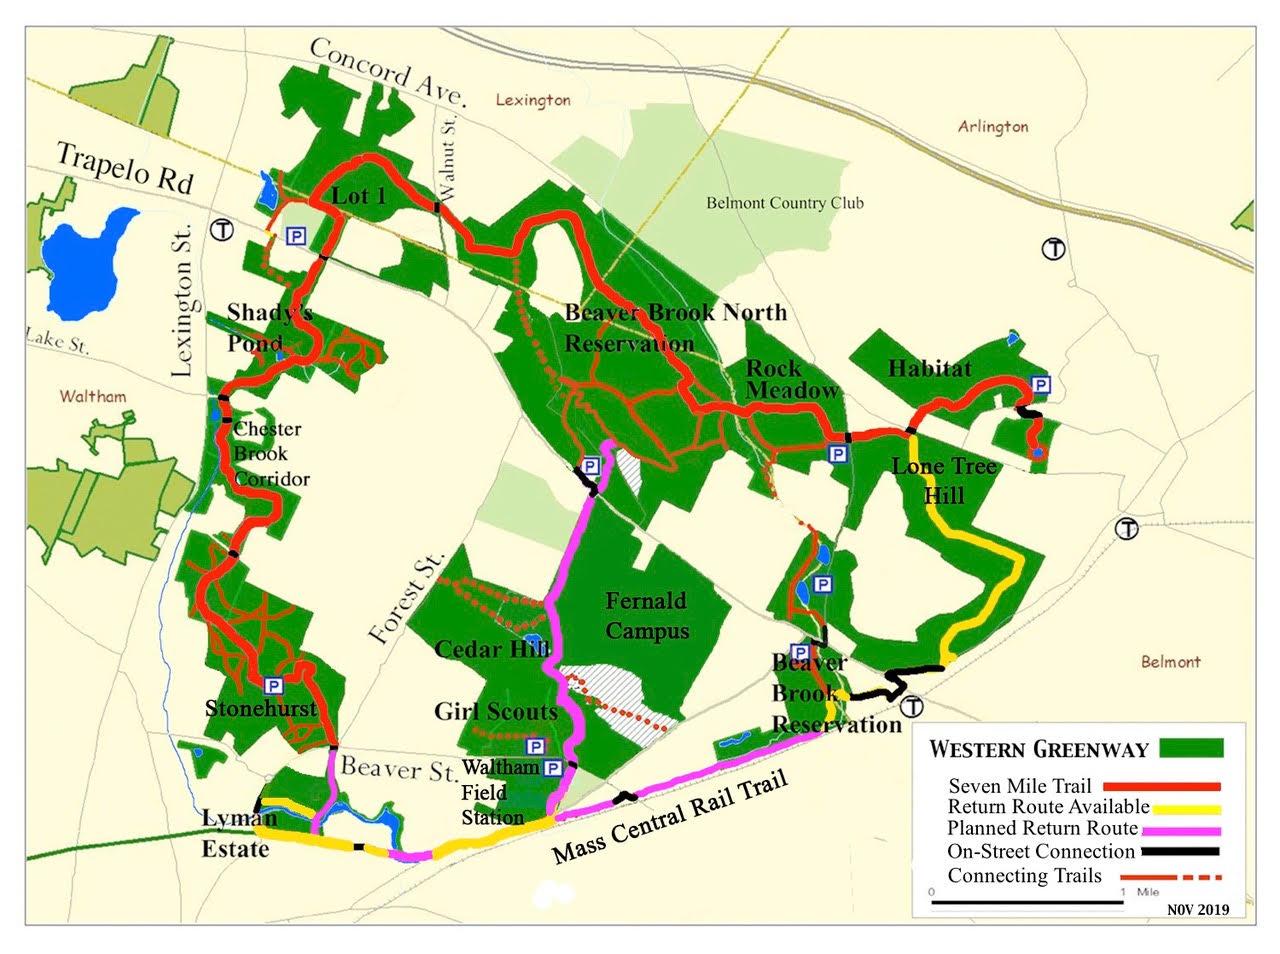 Western Greenway Map